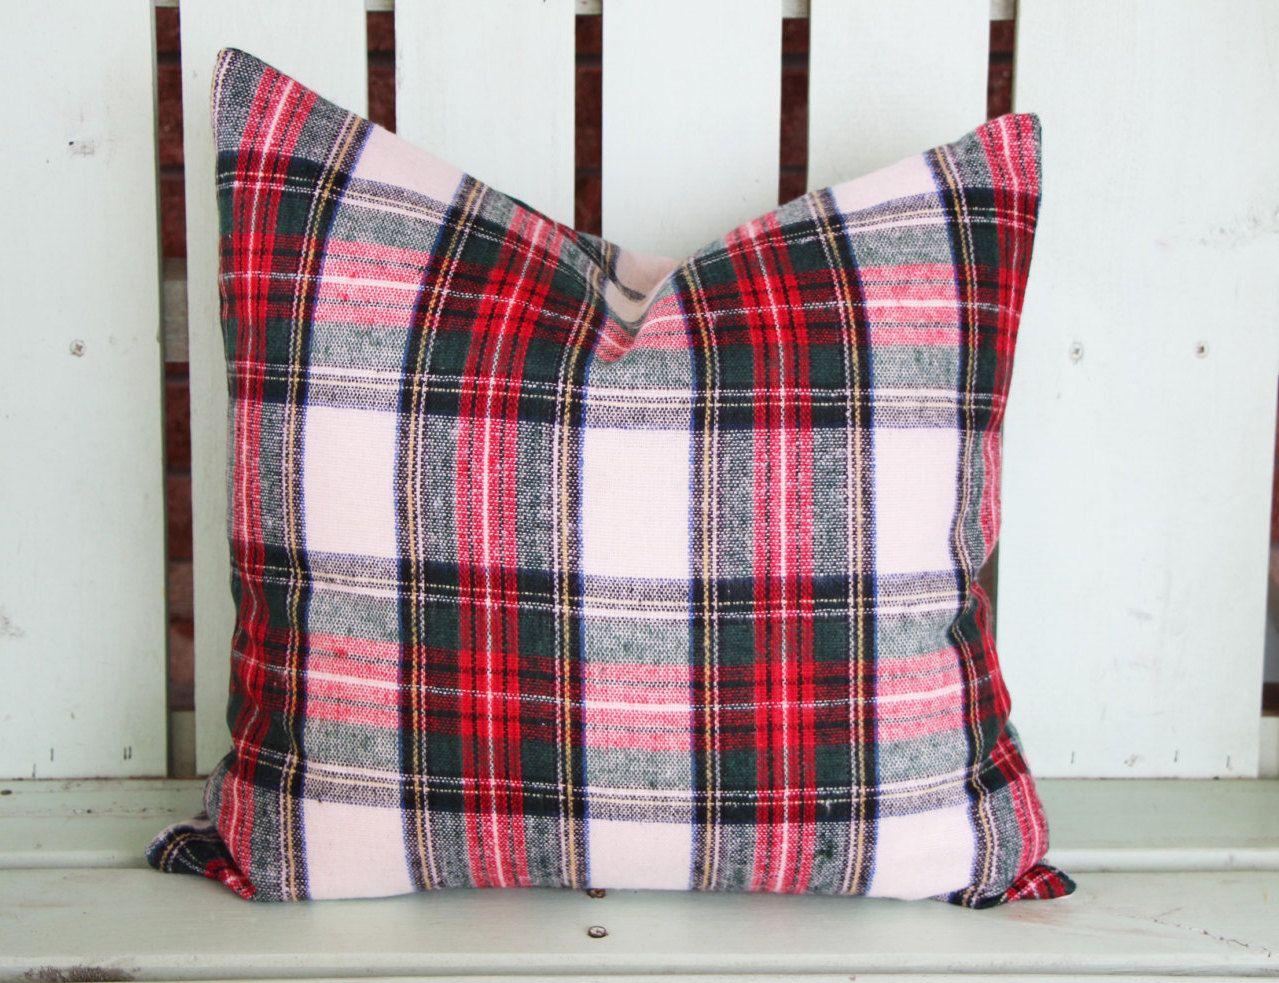 Plaid Christmas Pillows.New 18x18 Plaid Christmas Pillow Holiday Gift Decorative